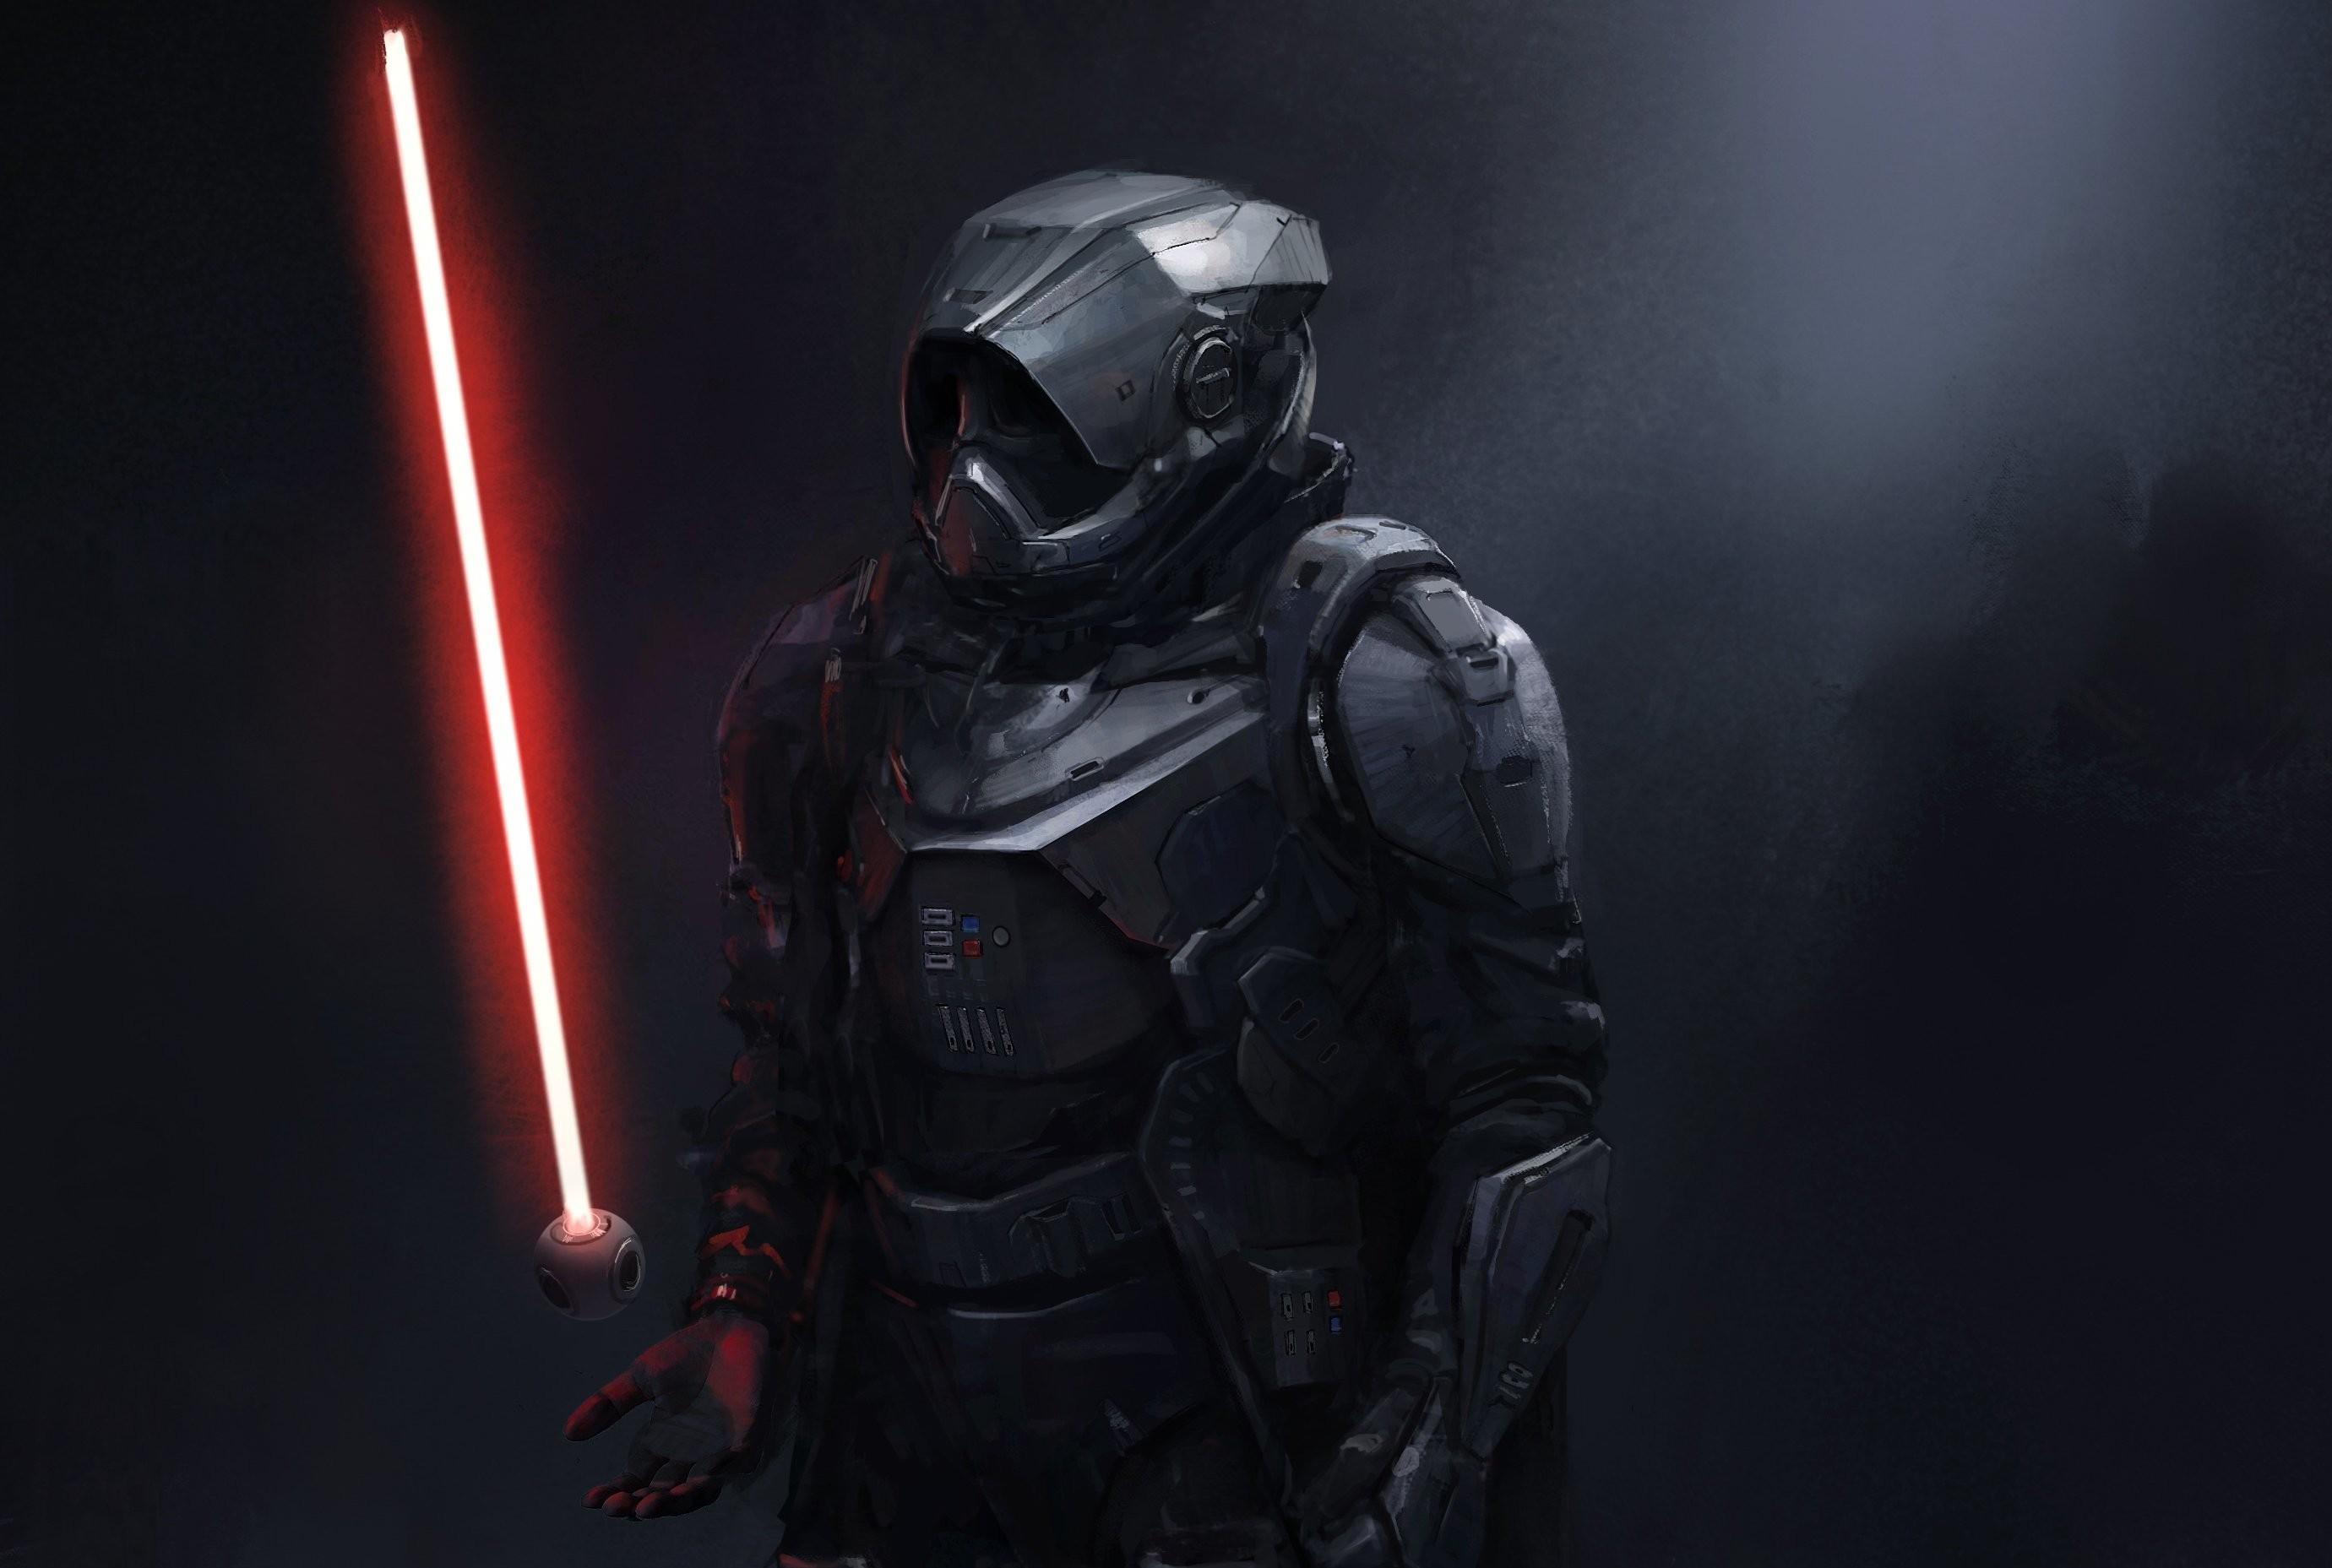 Star Wars Movies Sword Armor Anakin Skywalker darth vader sith … Desktop  wallpapers …